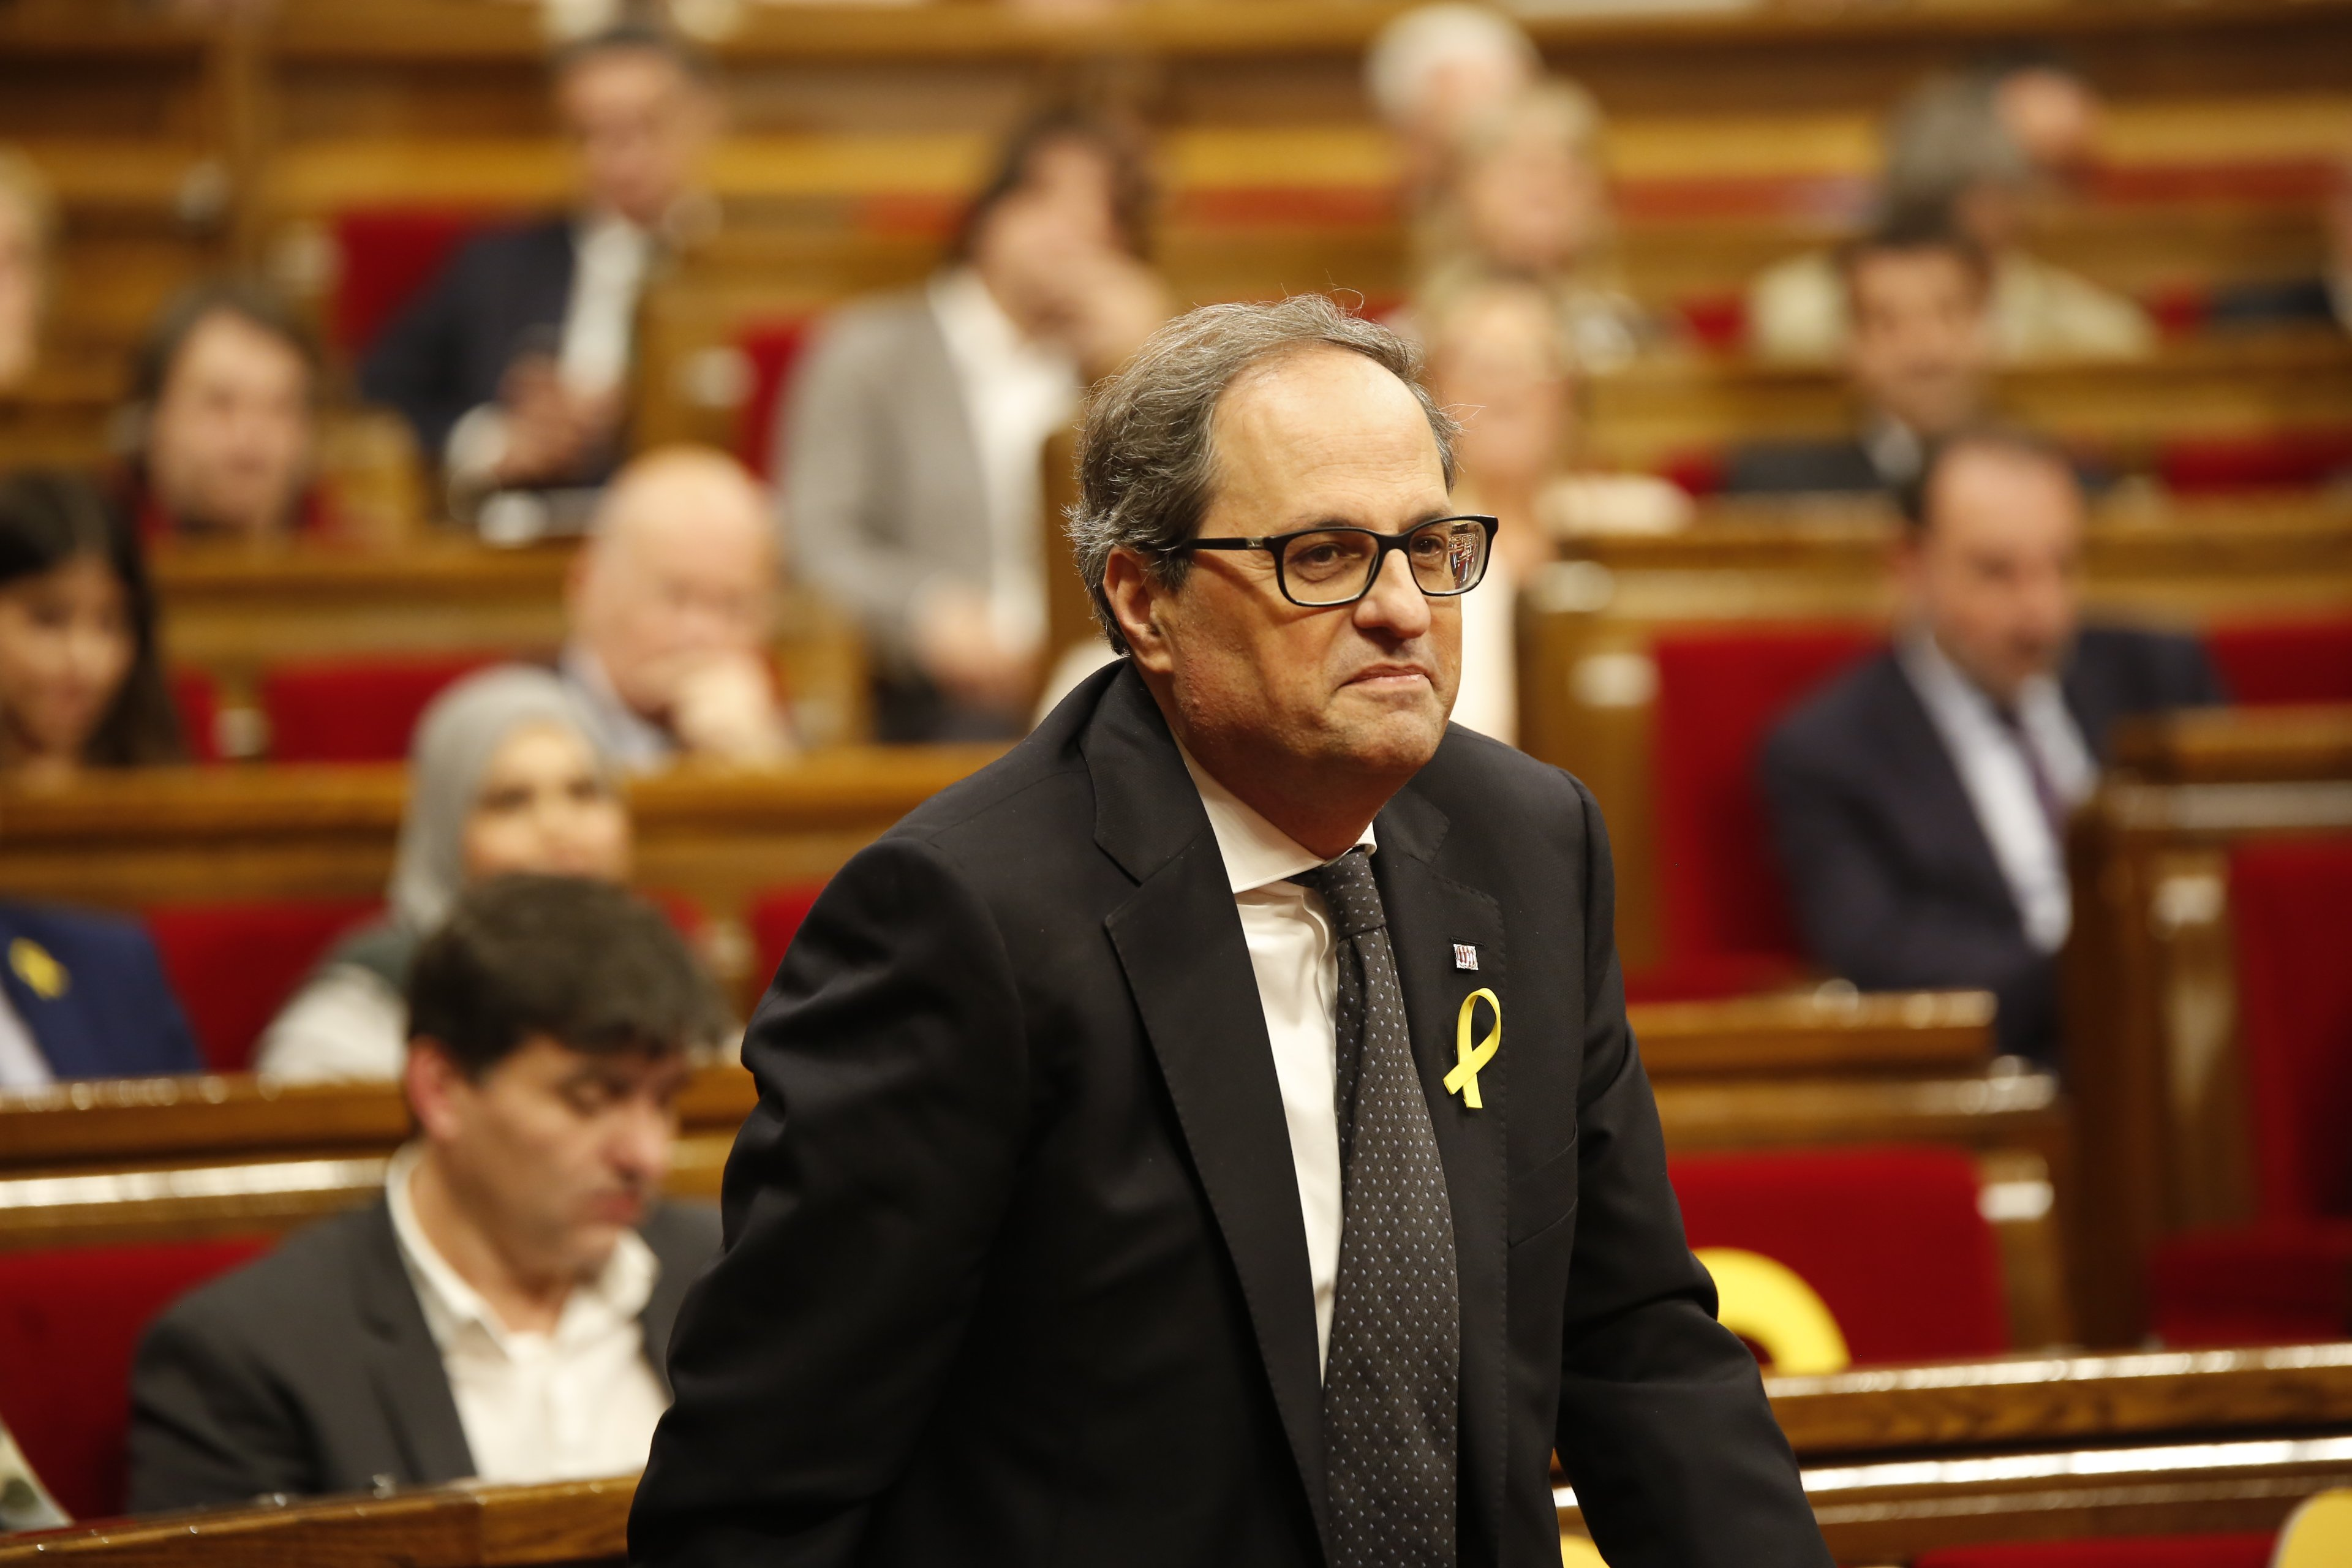 Quim Torra Hemicicle Parlament  - Sergi Alcàzar